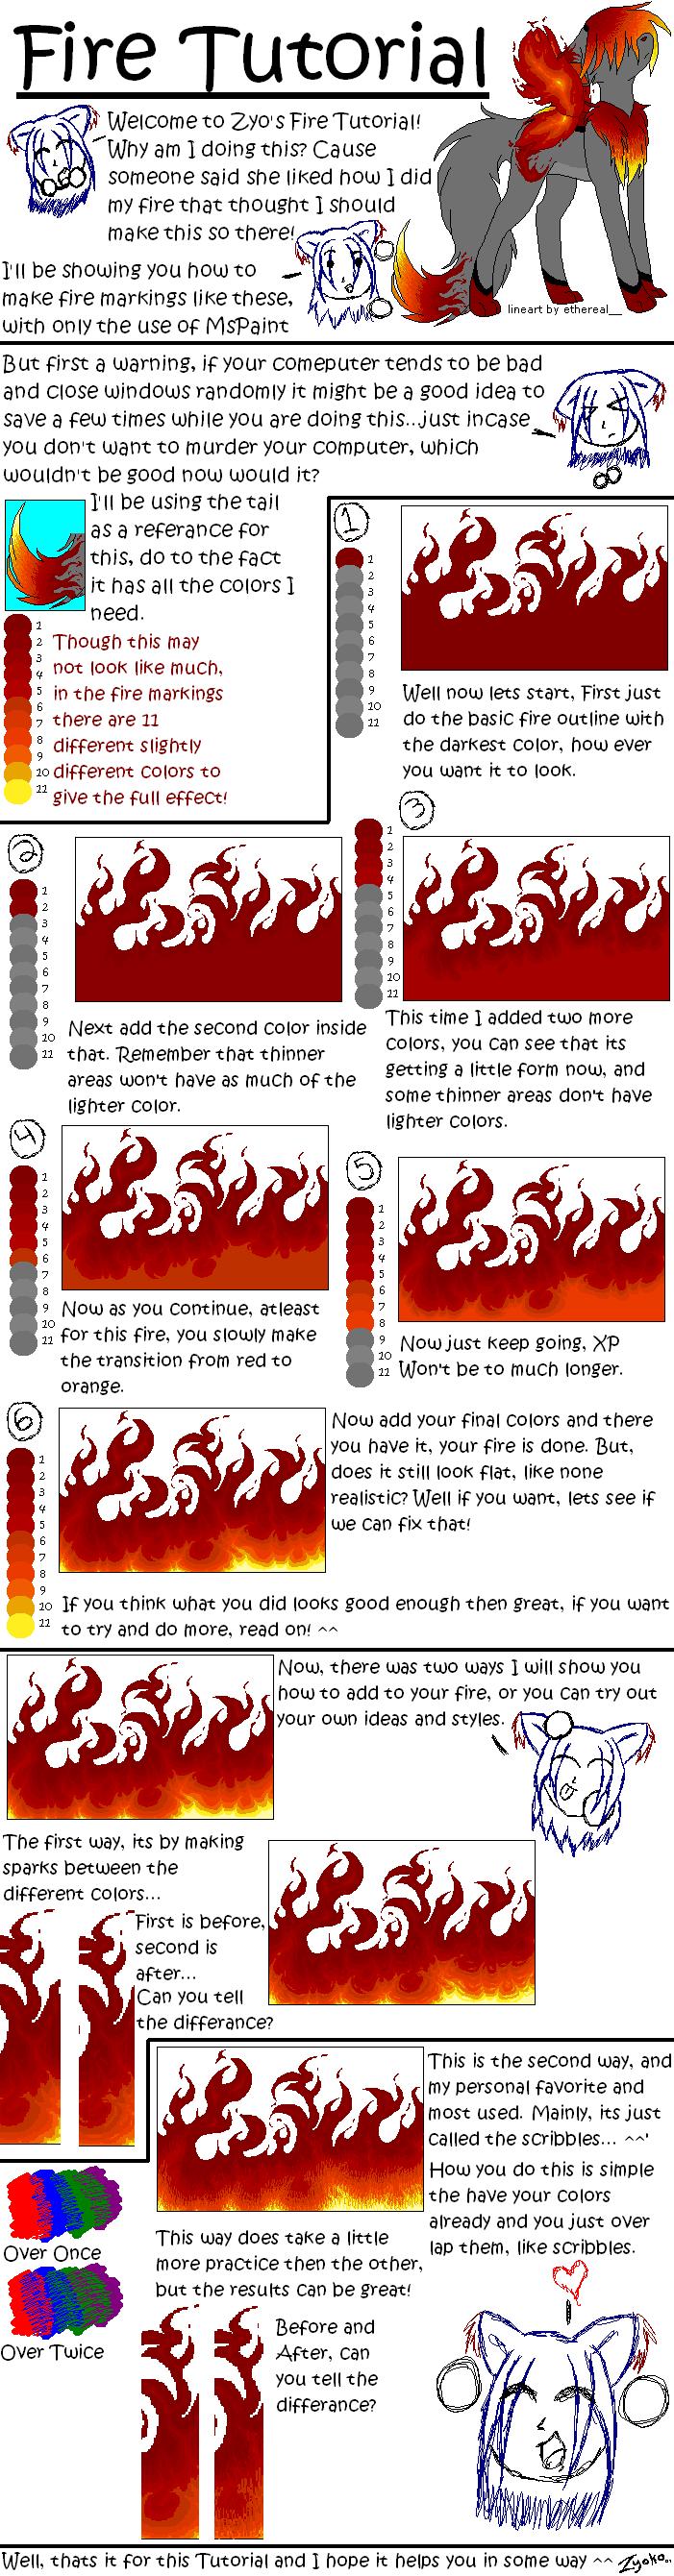 MsPaint Fire Tutorial by Hawkein on DeviantArt